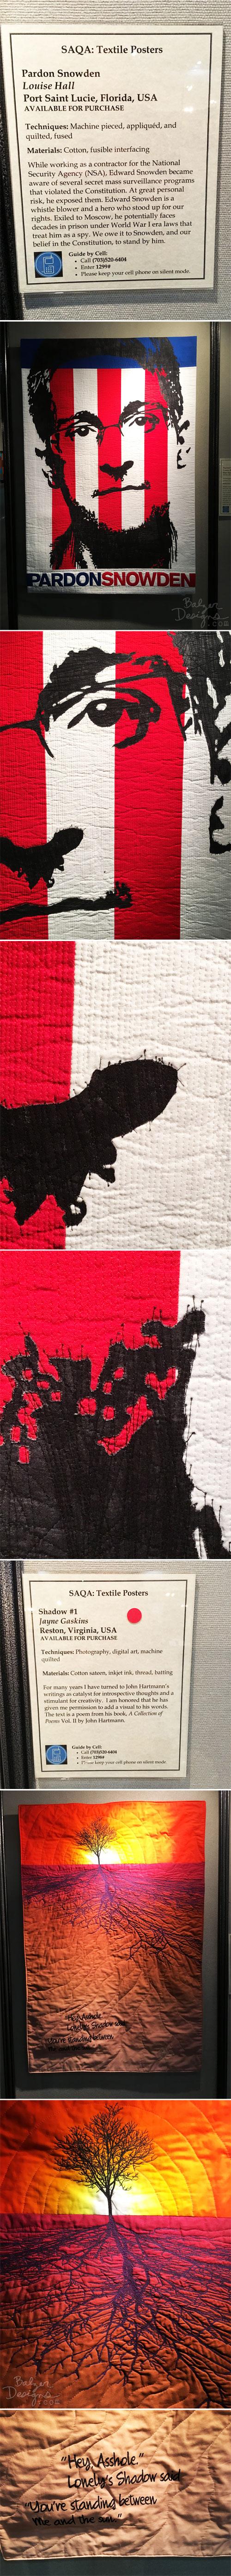 From the Balzer Designs Blog: Quilt Festival 2017: Part Six